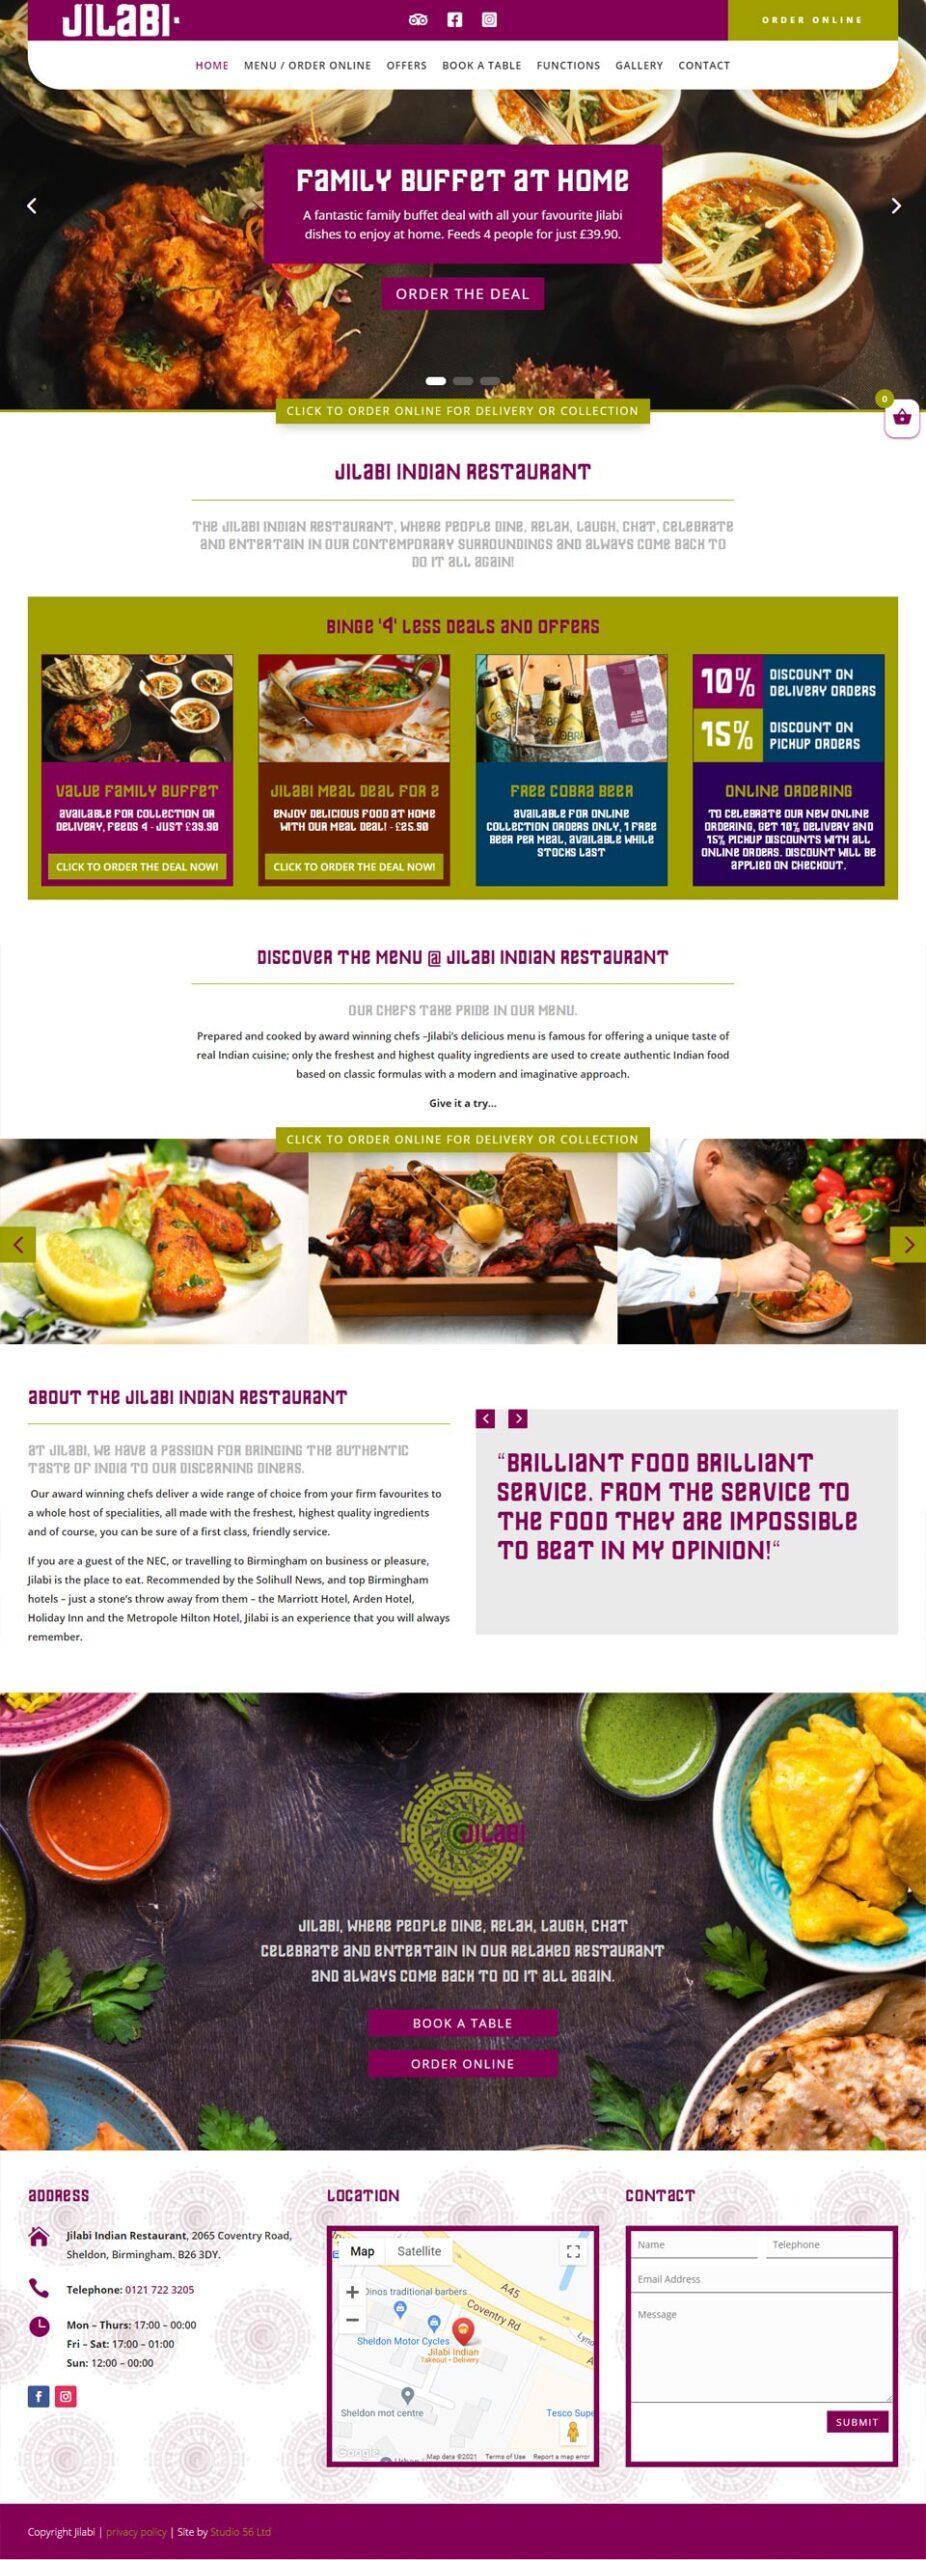 Jilabi online food ordering new website designed and developed by Studio 56